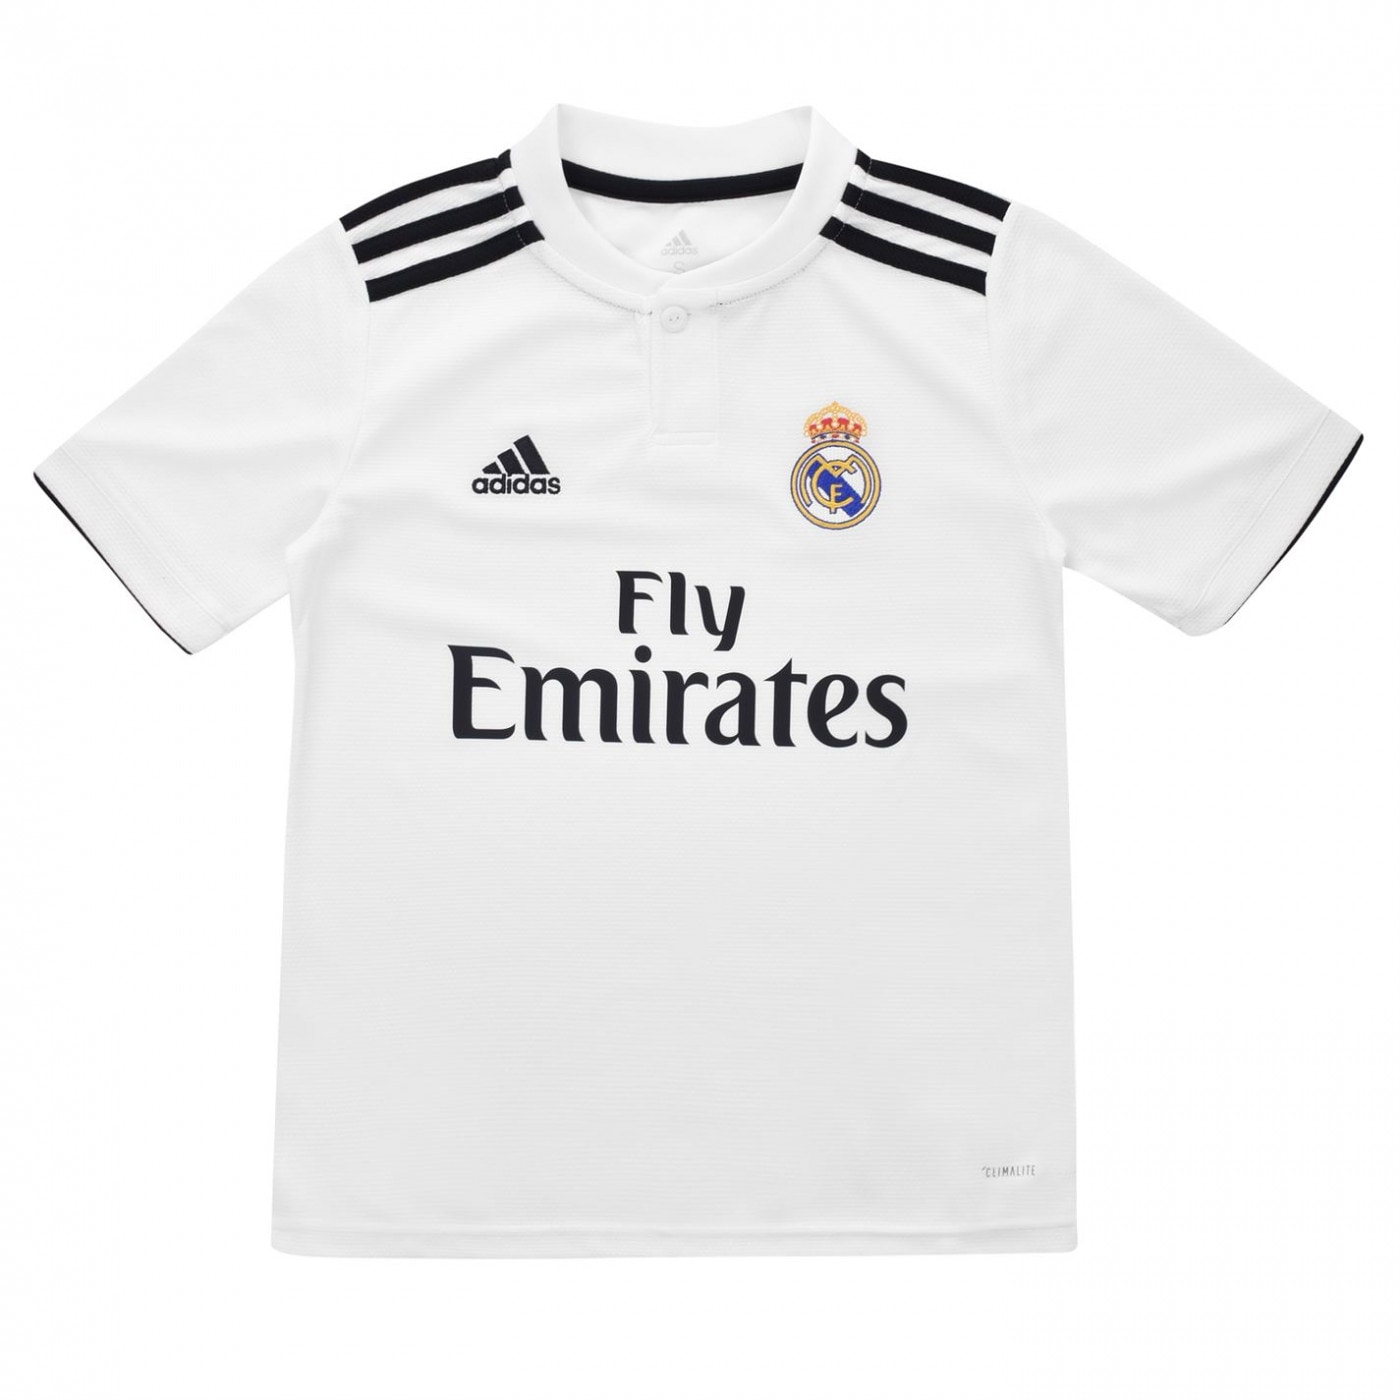 5f9a4dfc7b4ed Adidas Real Madrid Home Jersey Junior Boys - FACTCOOL